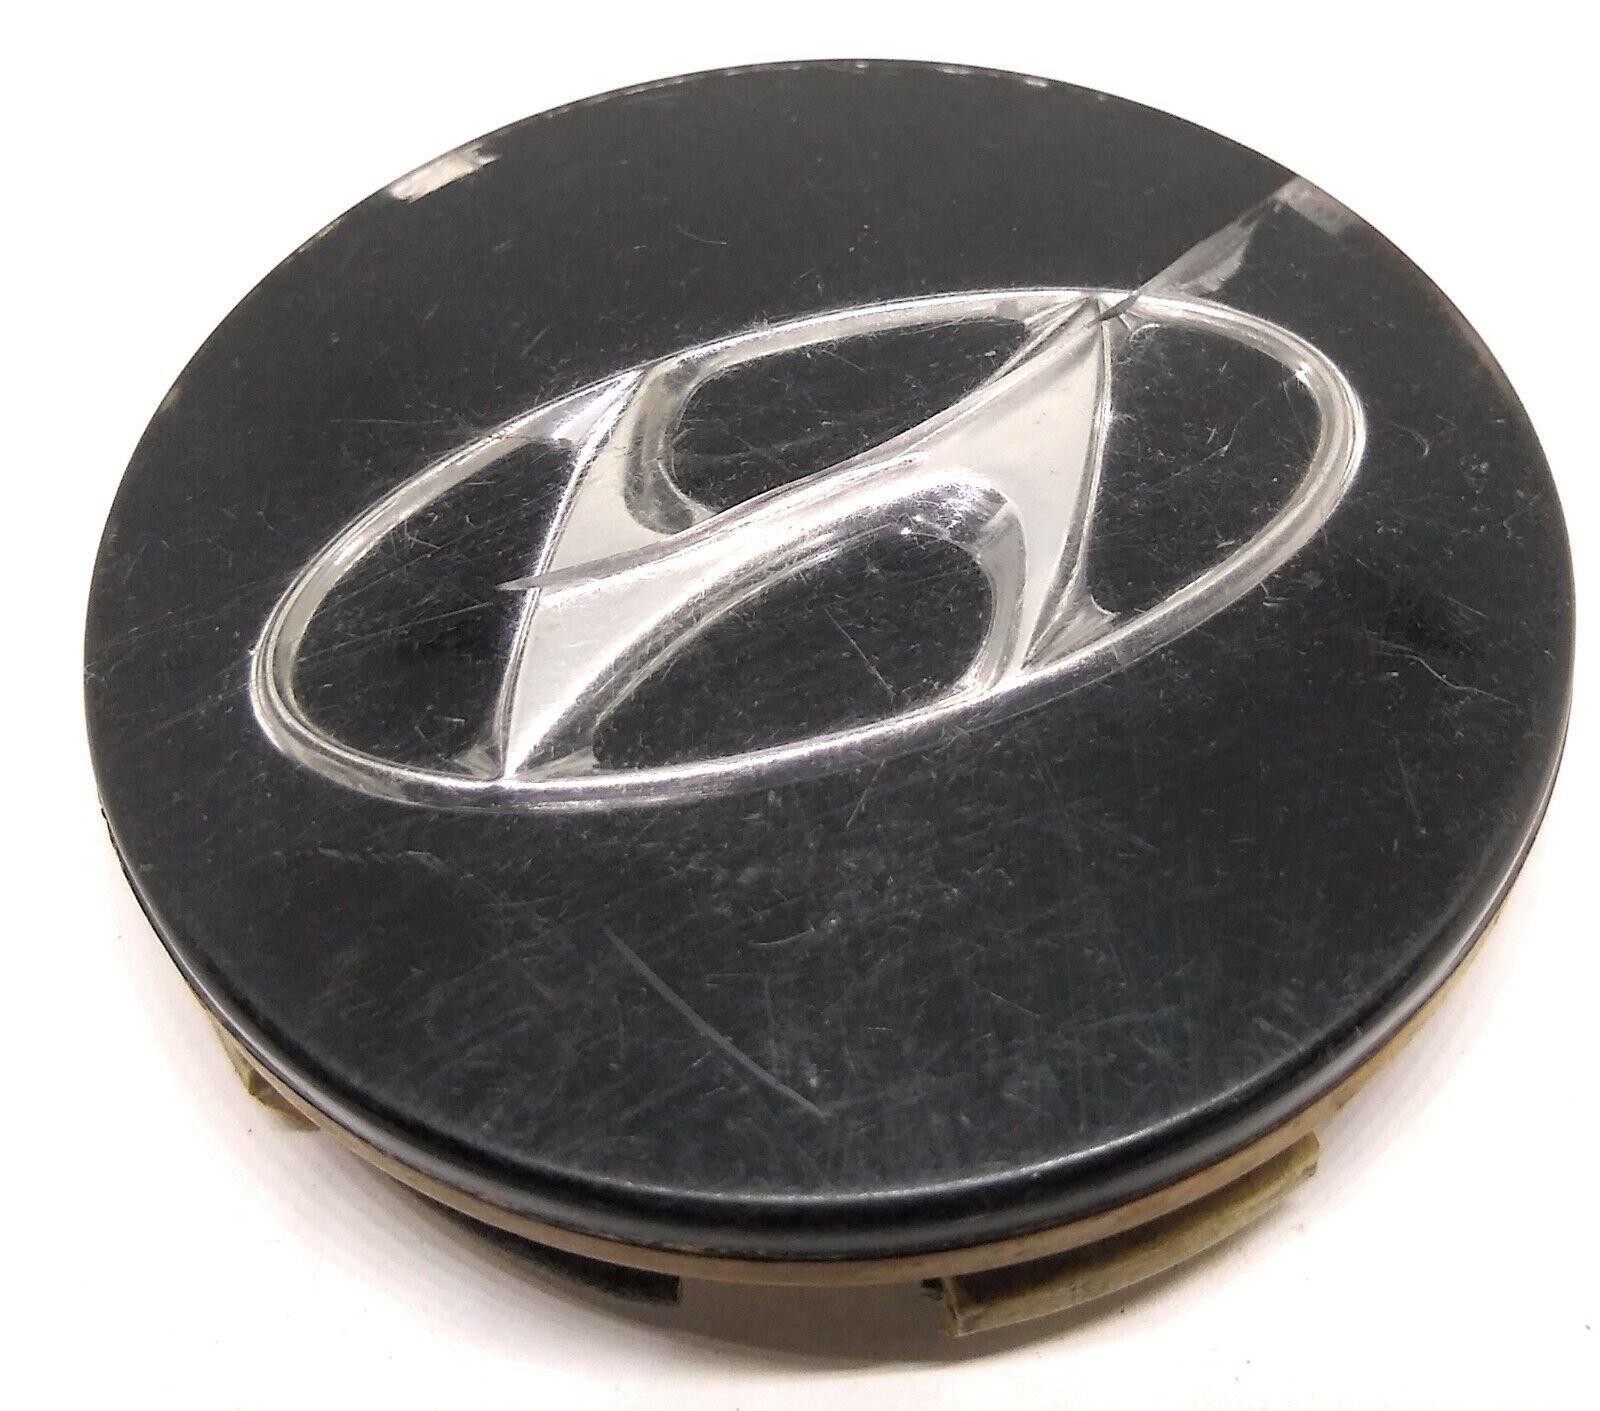 Center Caps Hubcaps Hyundai Santa Fe Wheel 05 06 OEM 52960-26400 Wheels, Tires & Parts Wheel Center Caps